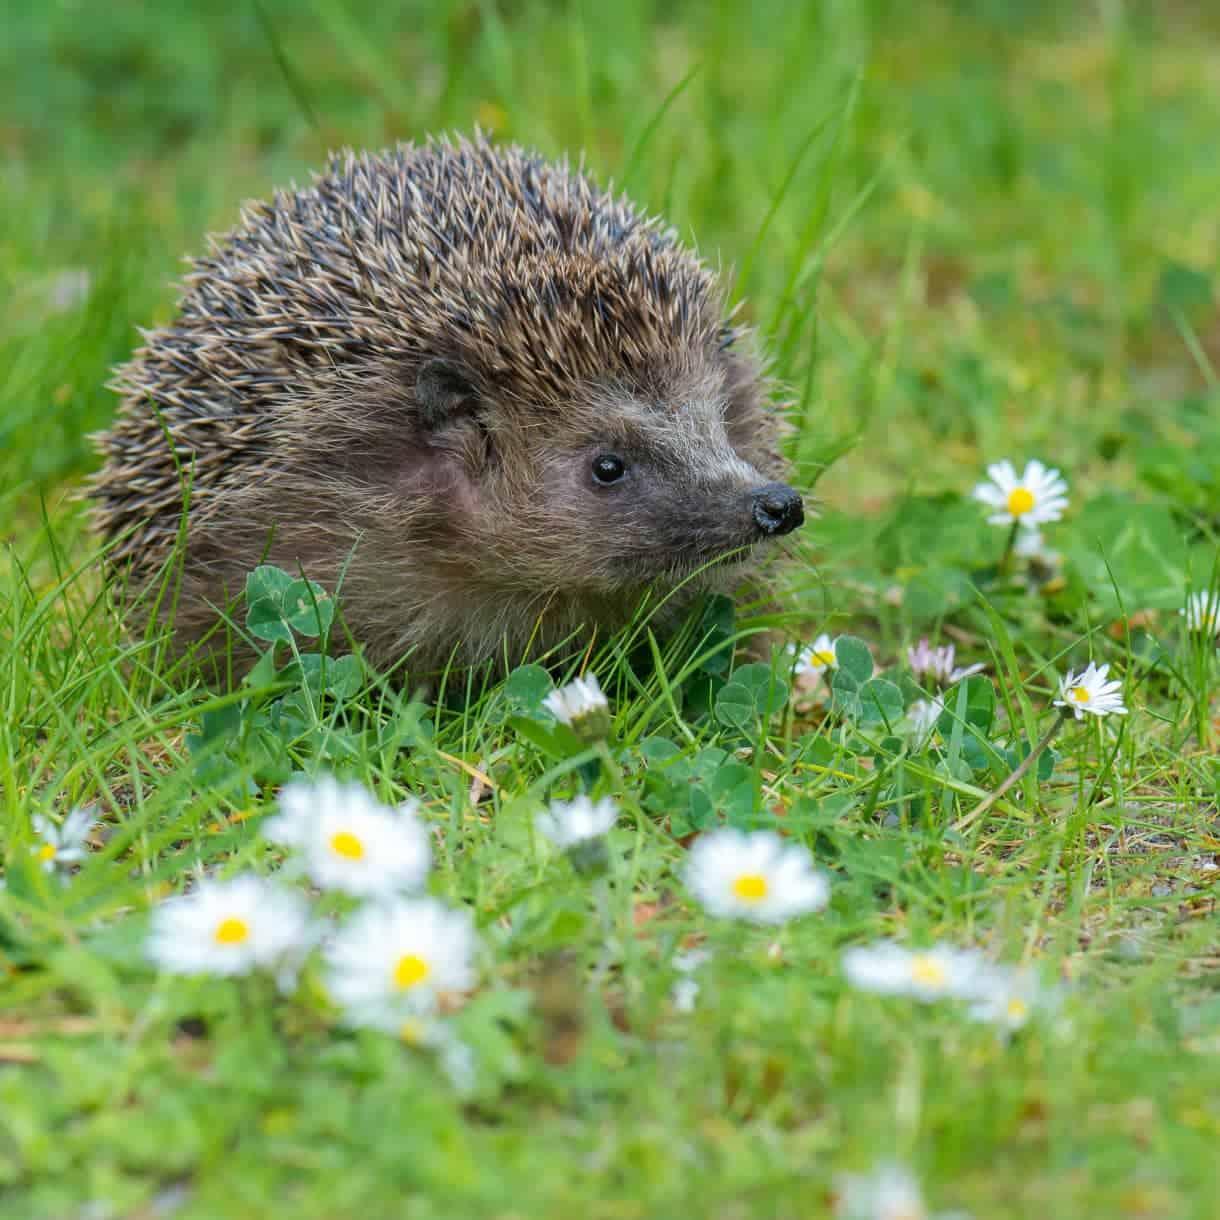 It's time to hibernate, Hedgehog! - GardenBird